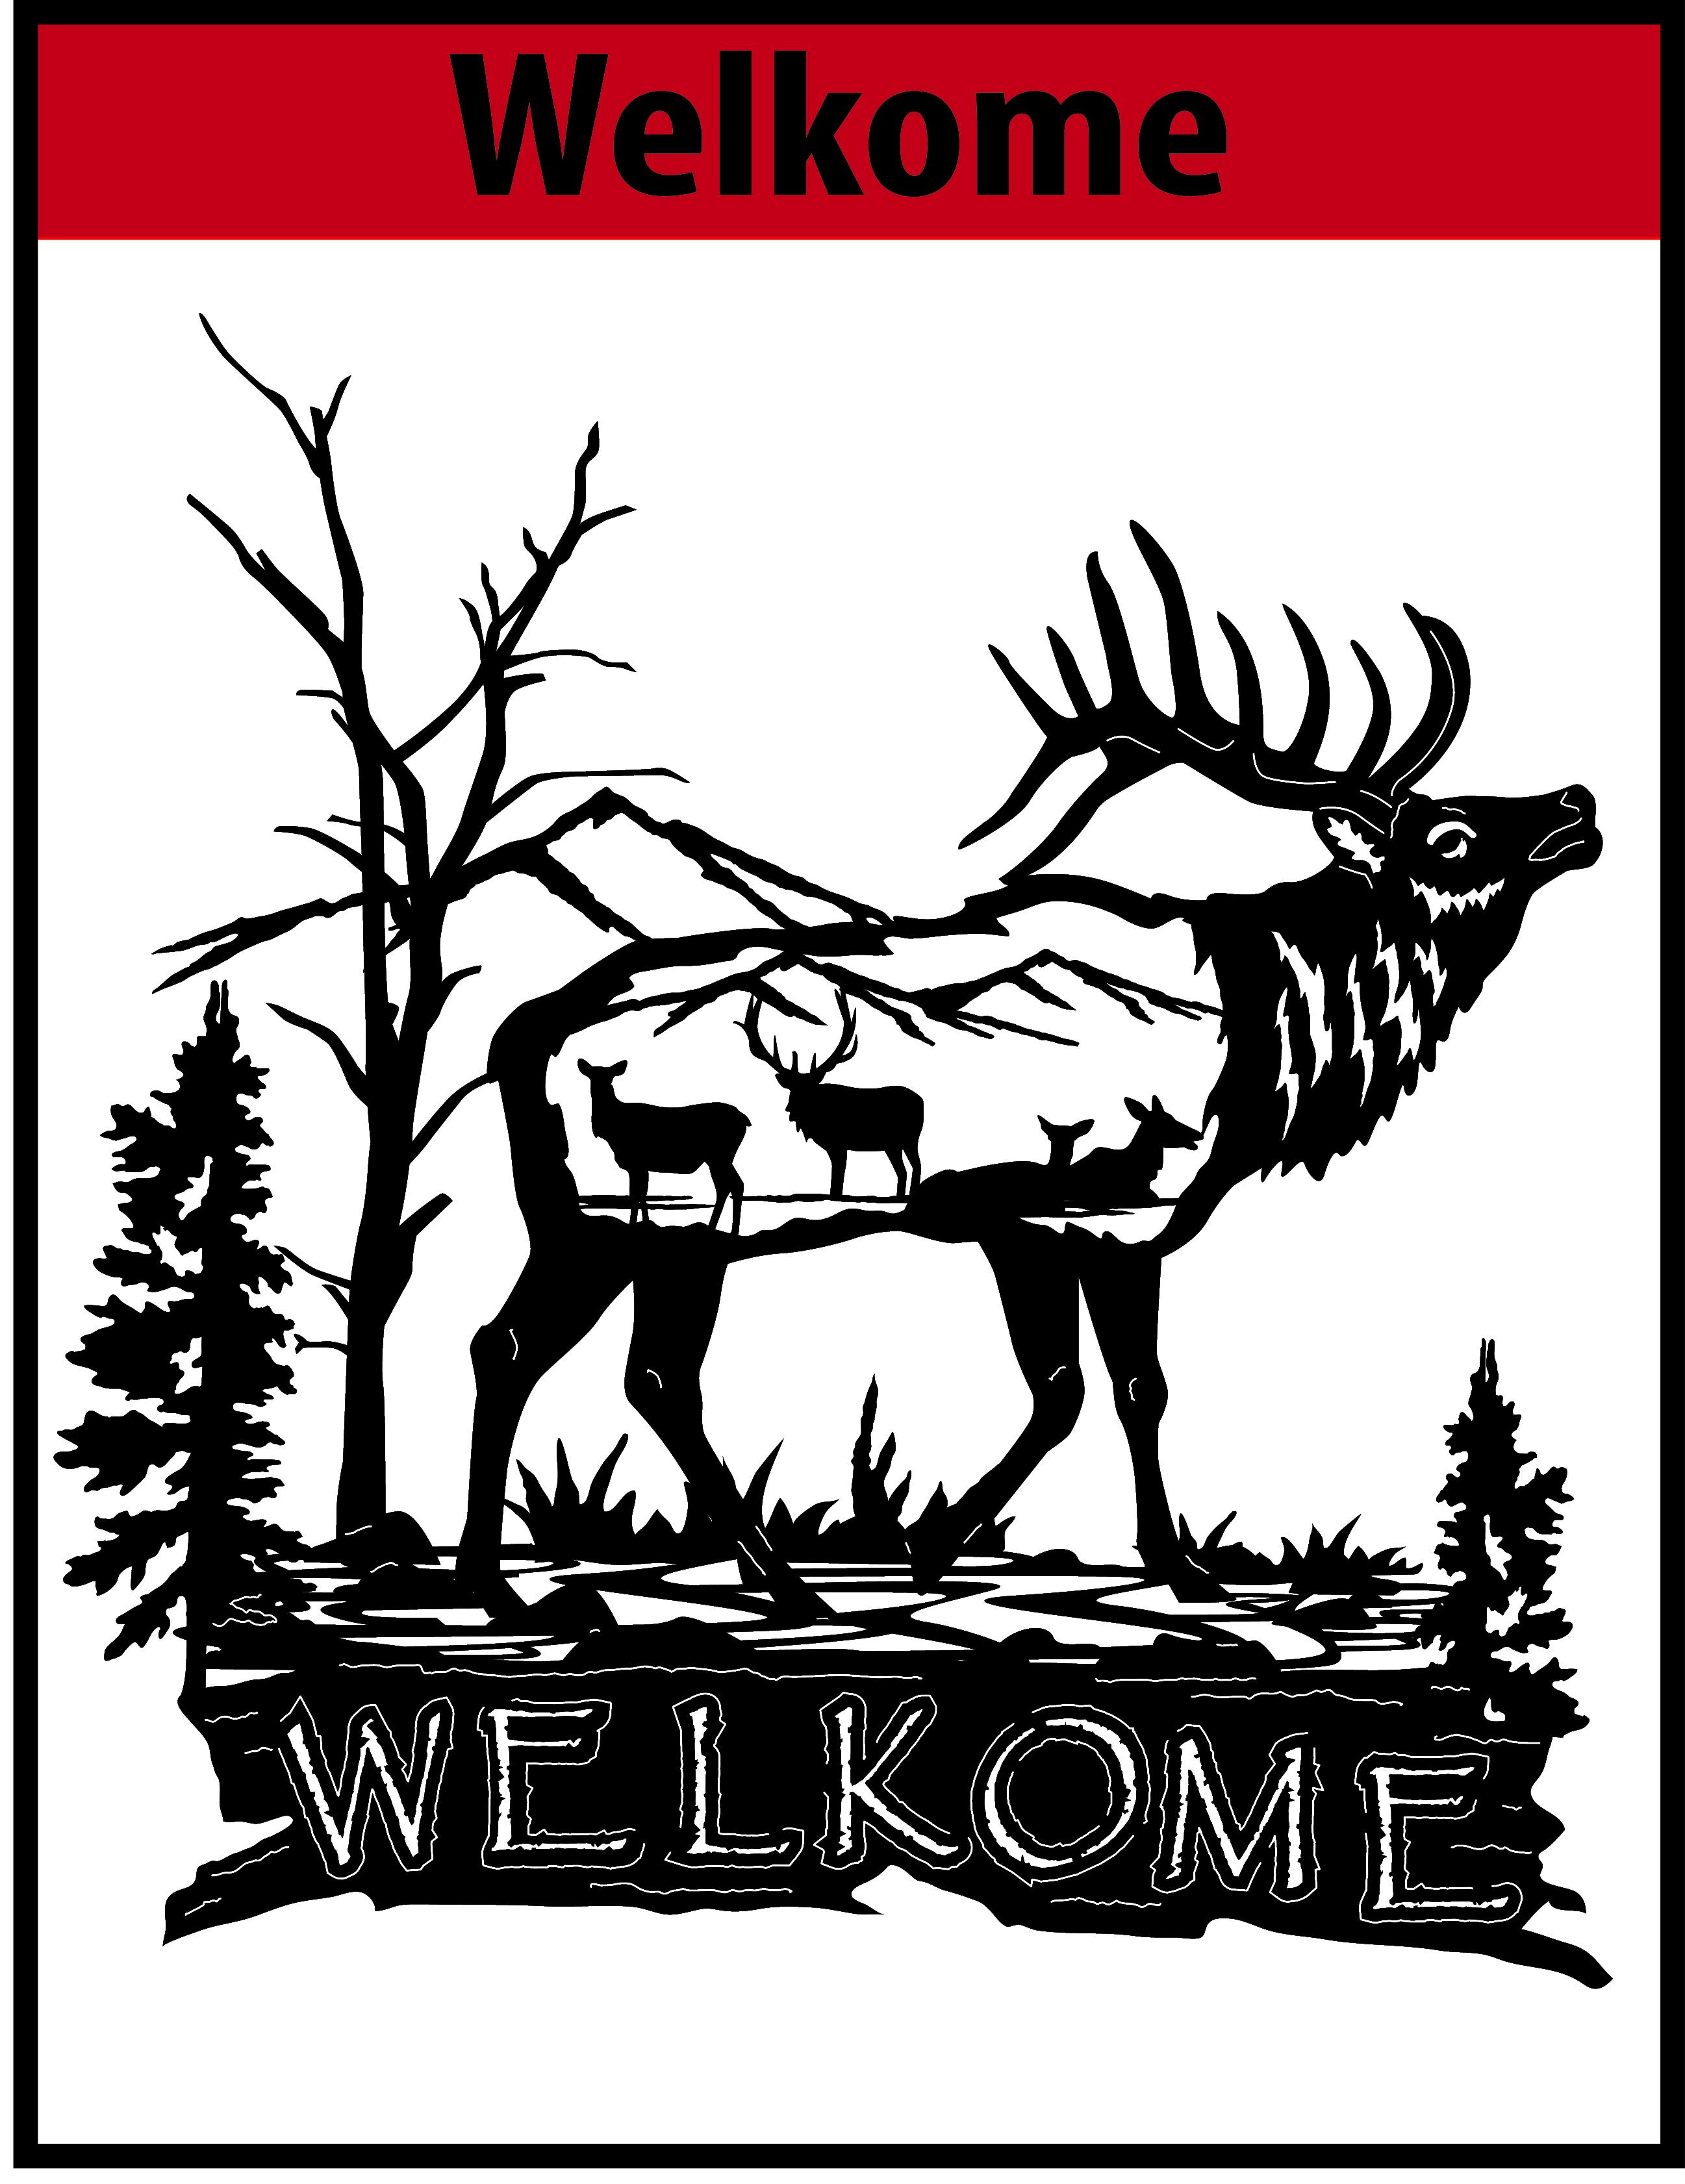 Welkome Elk Free DXF File   CNC DXF Files